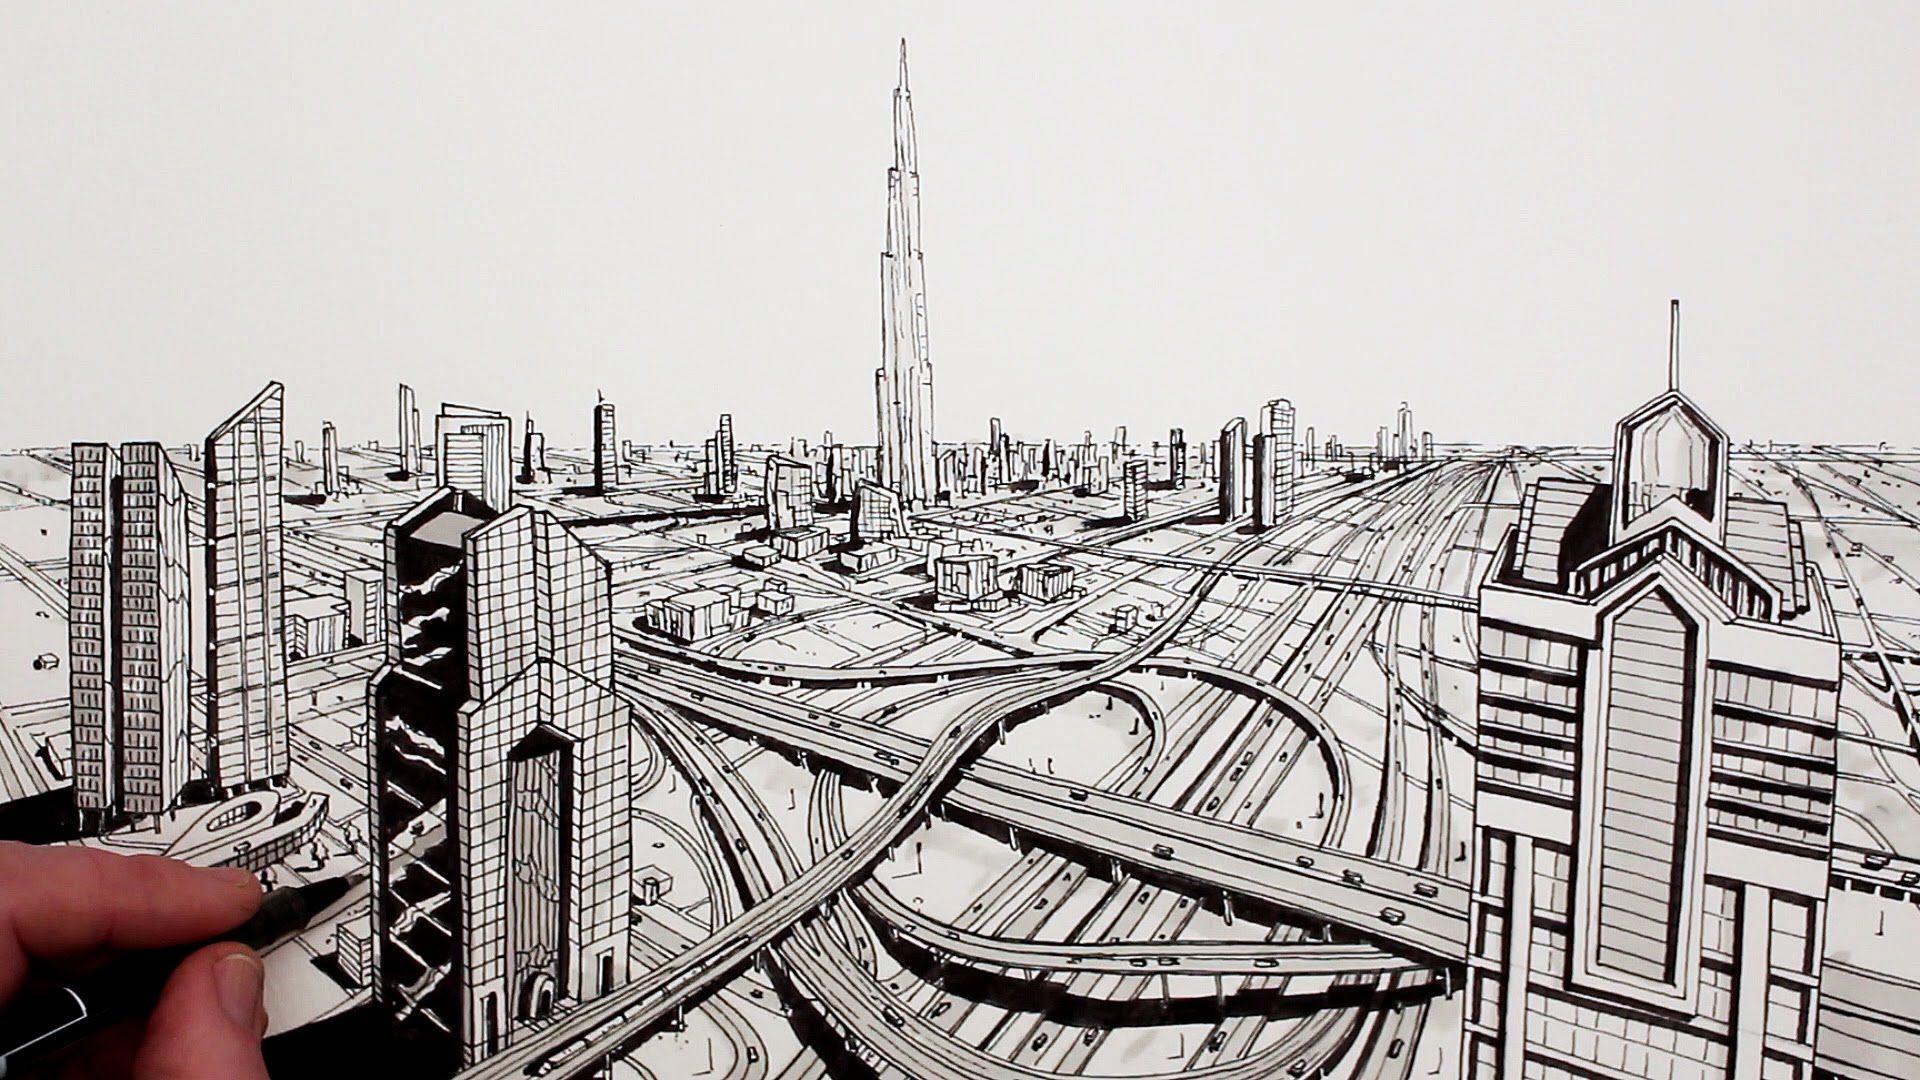 How To Draw Dubai City In Perspective City Drawing Dubai City Youtube Art Tutorials